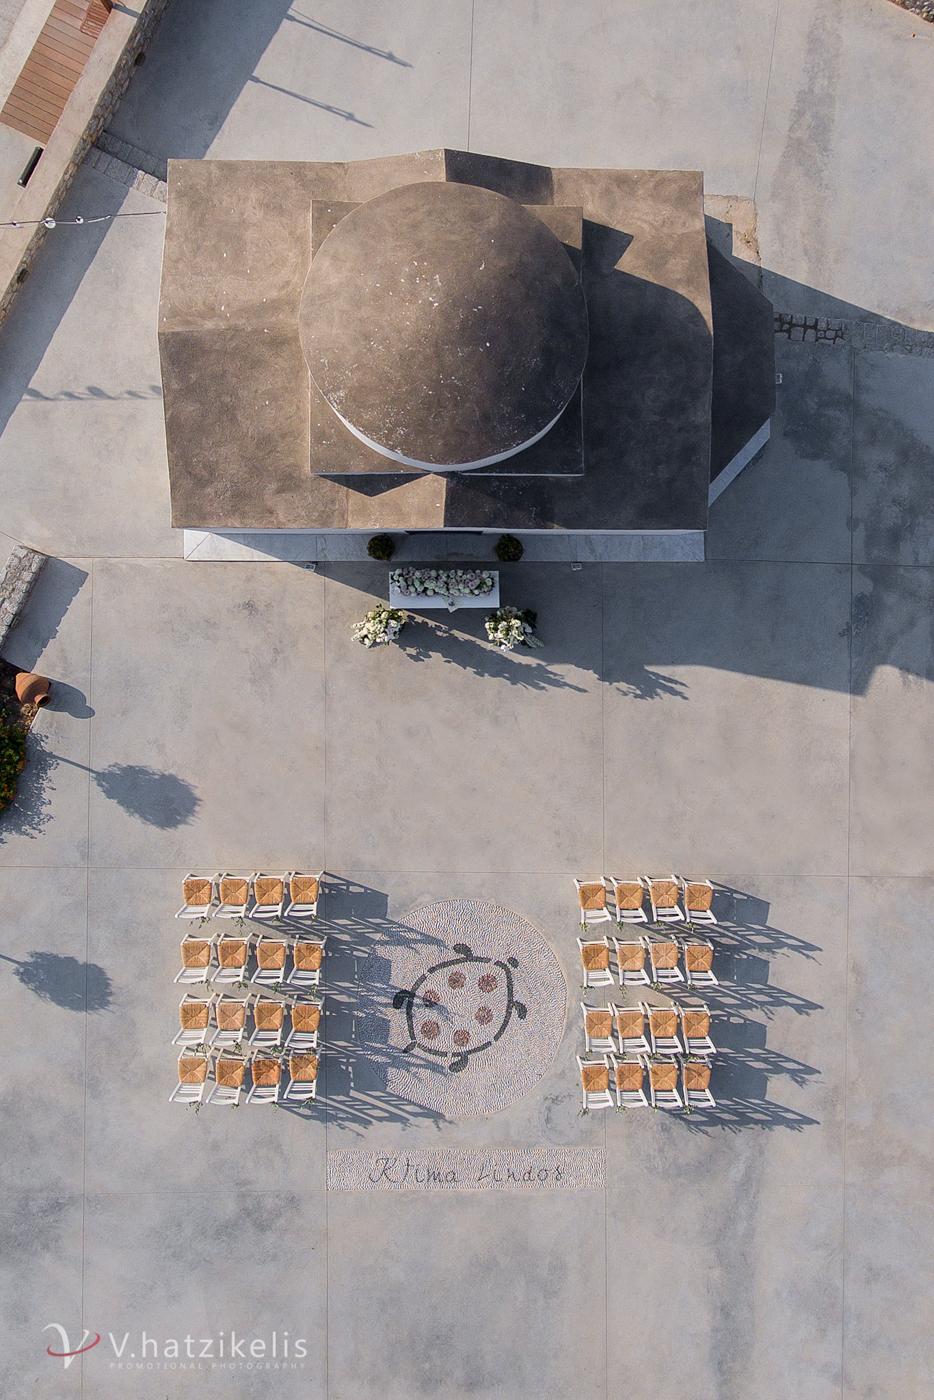 v hatzikelis photography aerial-28